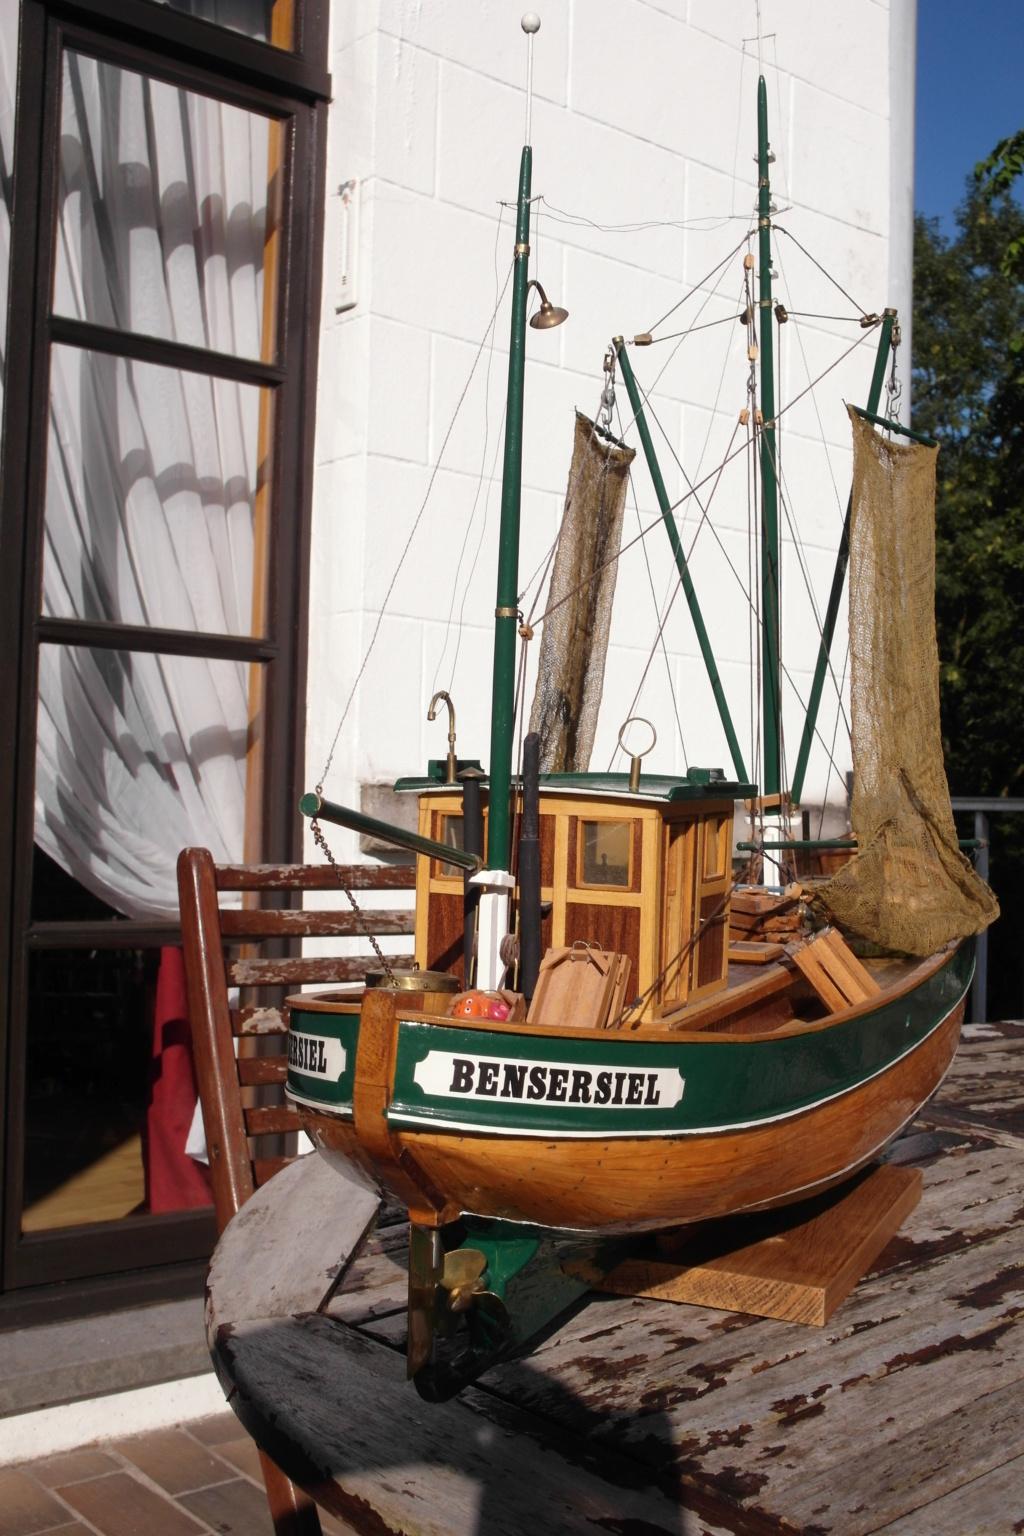 Bensersiel - BEN 10 Sam_0070